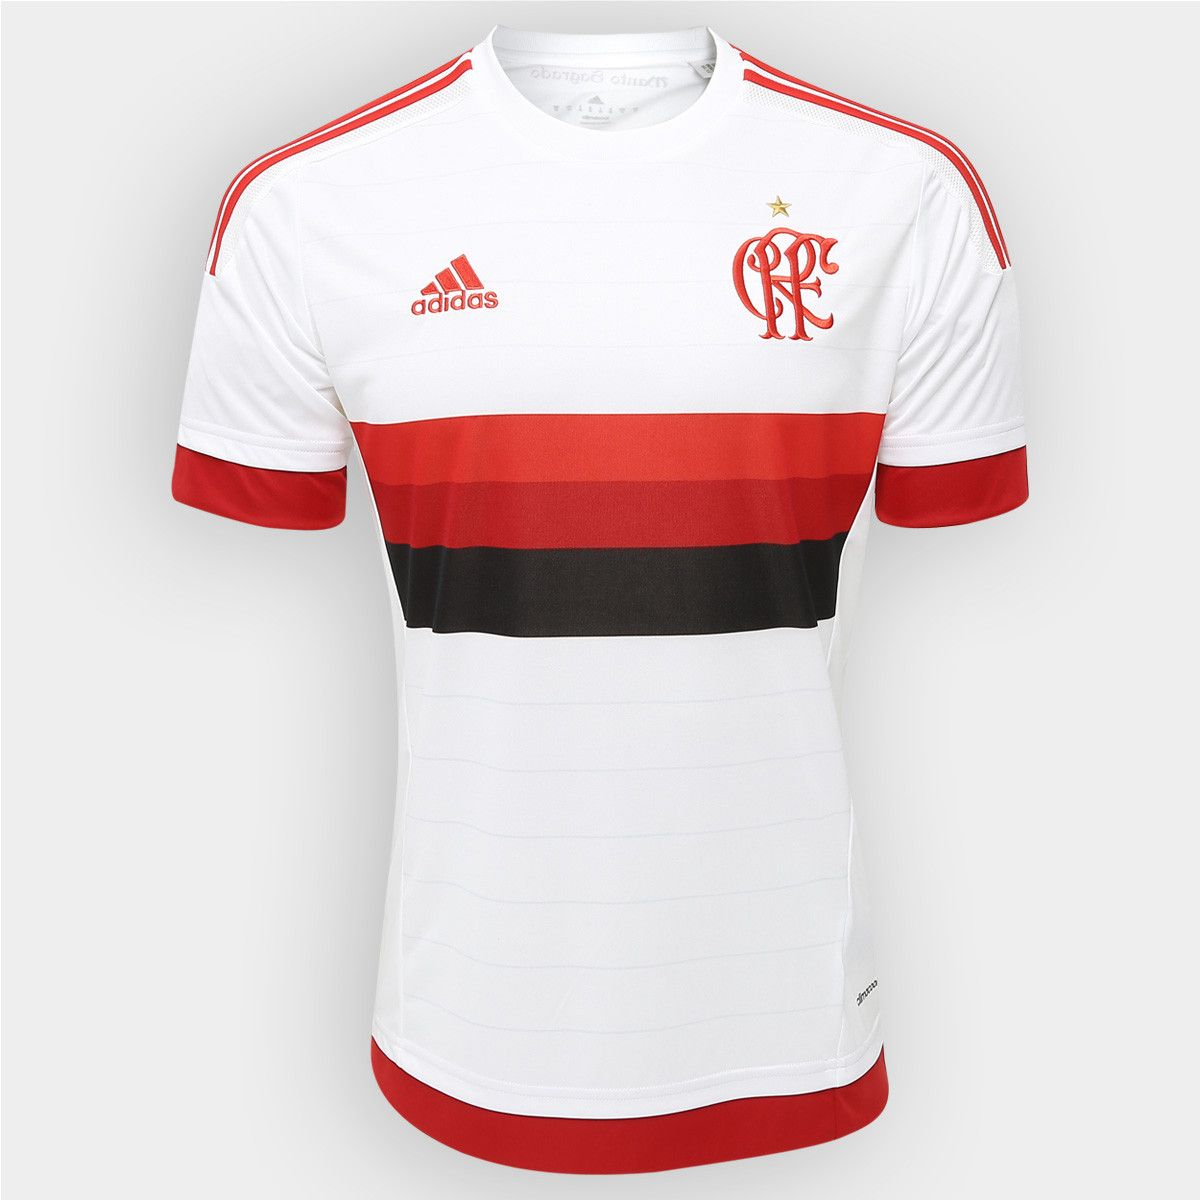 08ffc77078 Camisa Flamengo II 15 16 s nº - Torcedor Adidas Masculina - Branco e ...